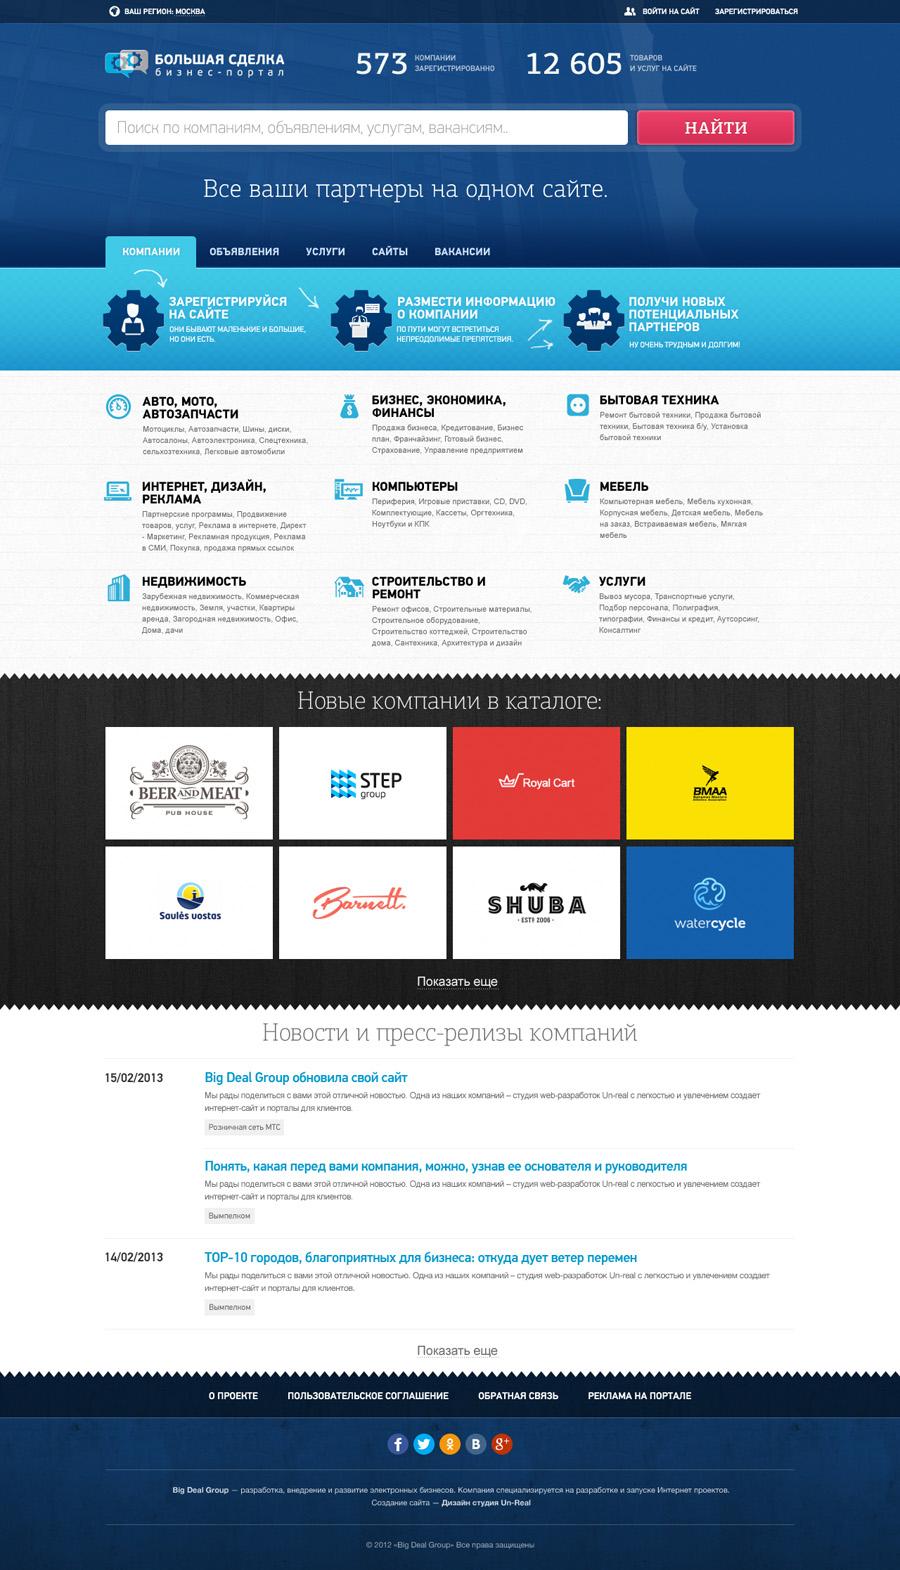 Бизнес-портал